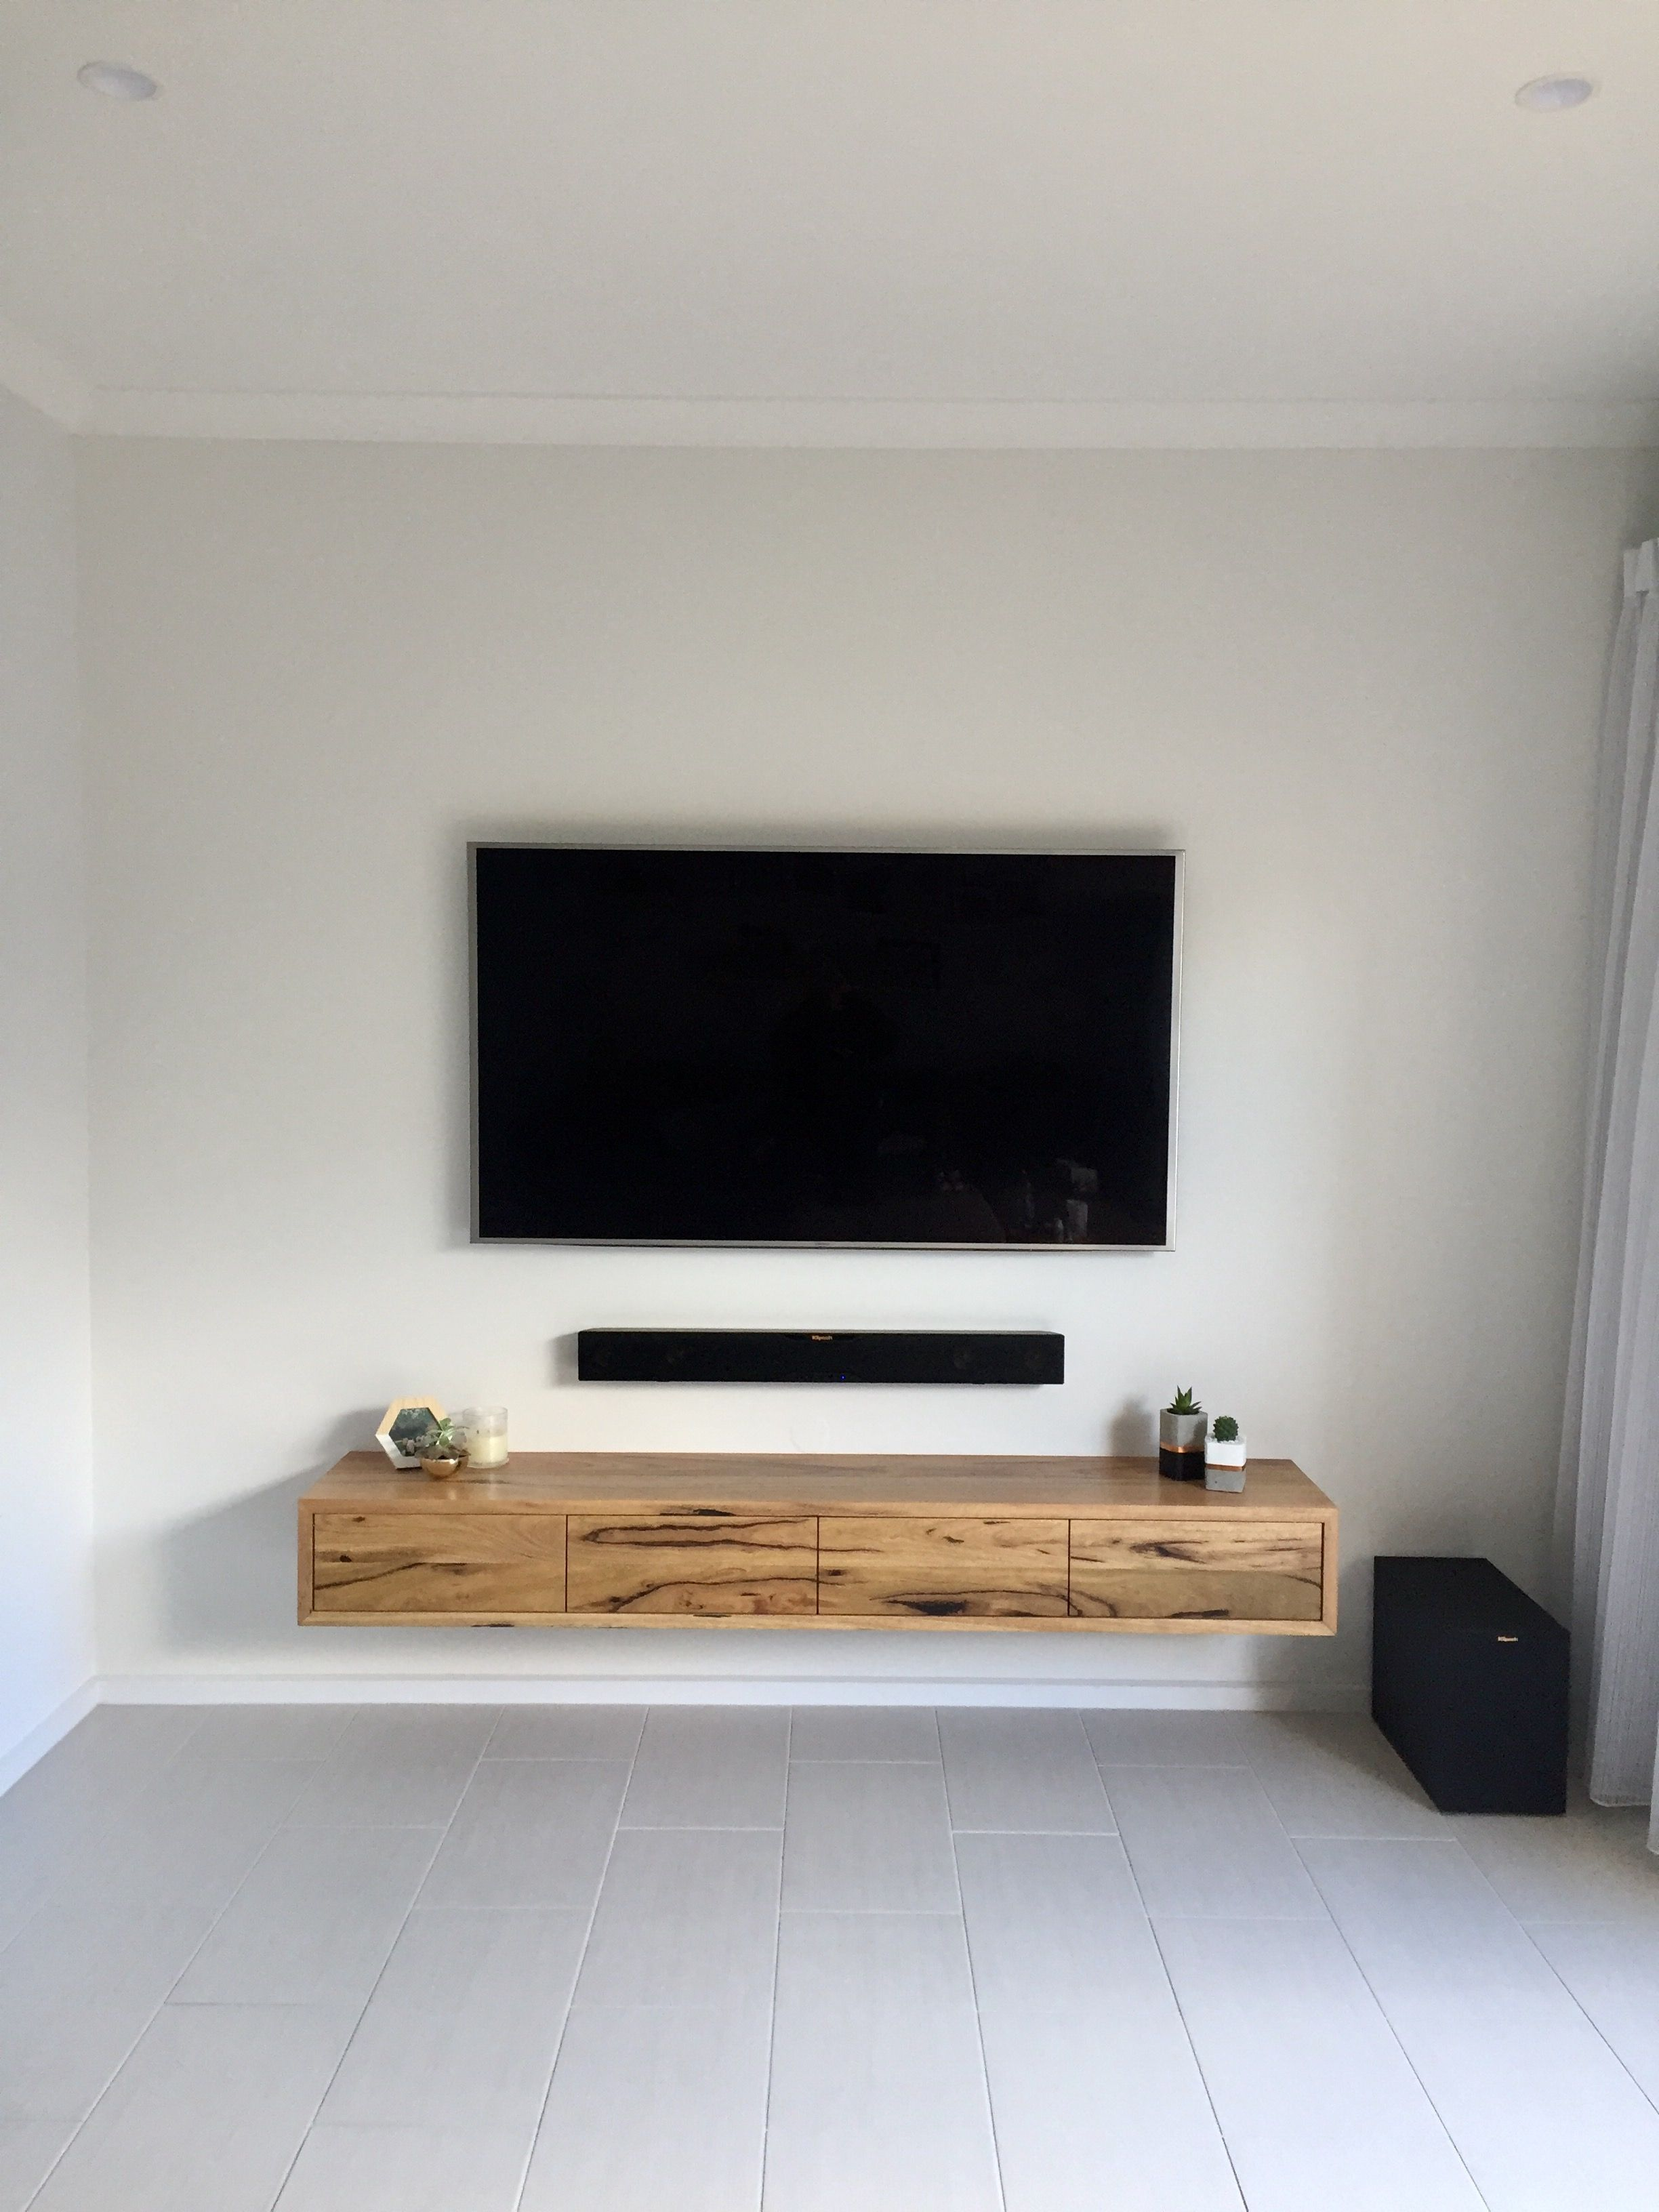 Collie Floating Tv Unit In 2020 Living Room Tv Floating